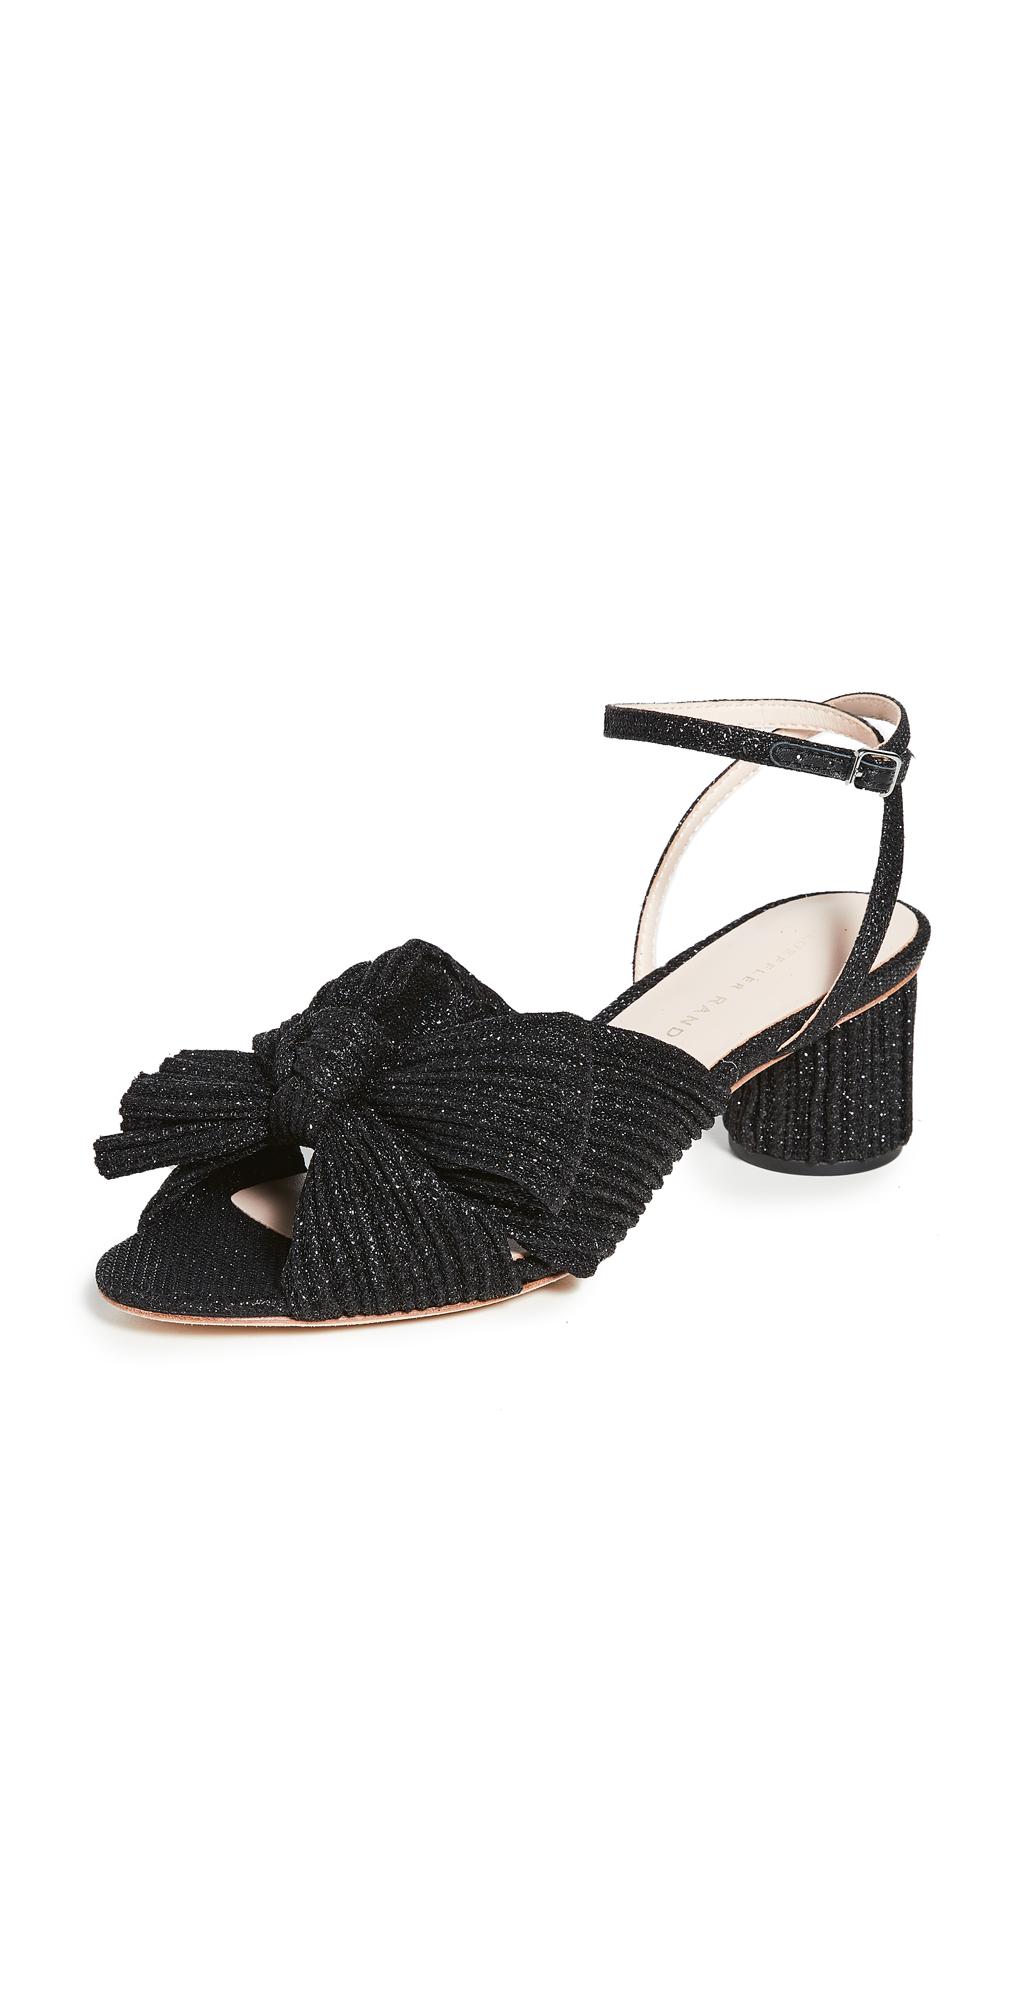 Loeffler Randall Dahlia Heeled Sandals